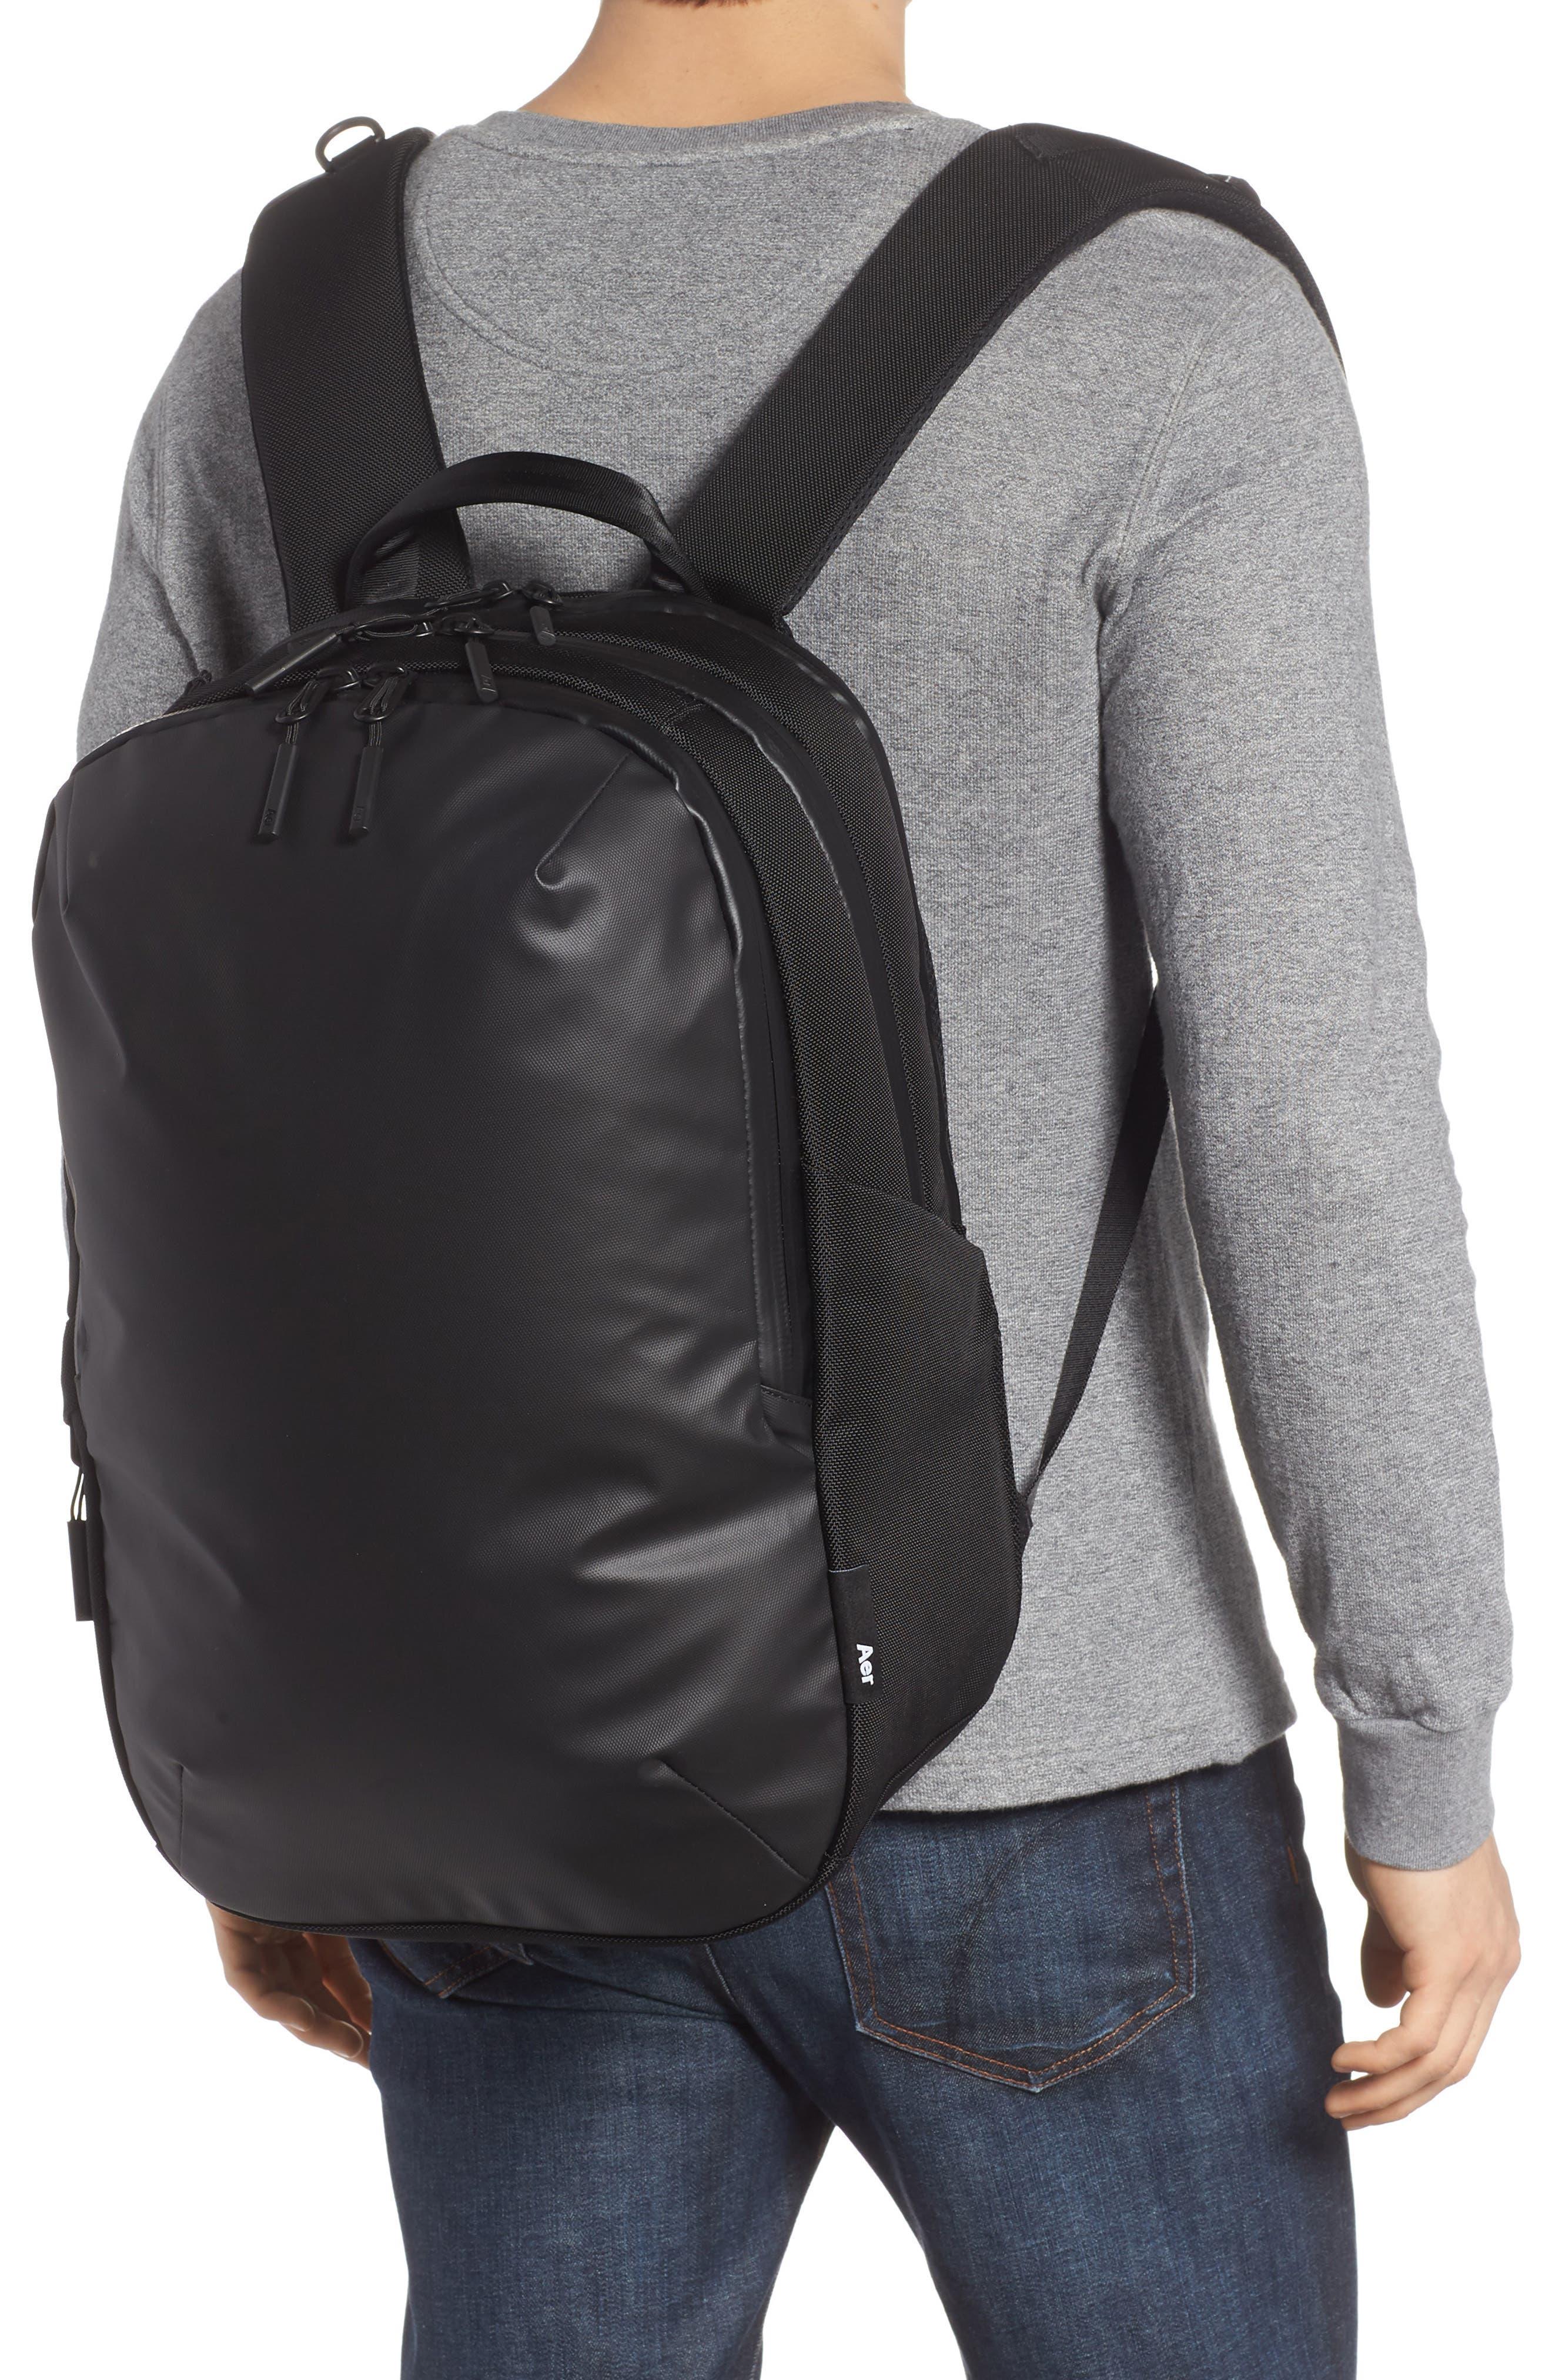 Tech Backpack,                             Alternate thumbnail 2, color,                             001